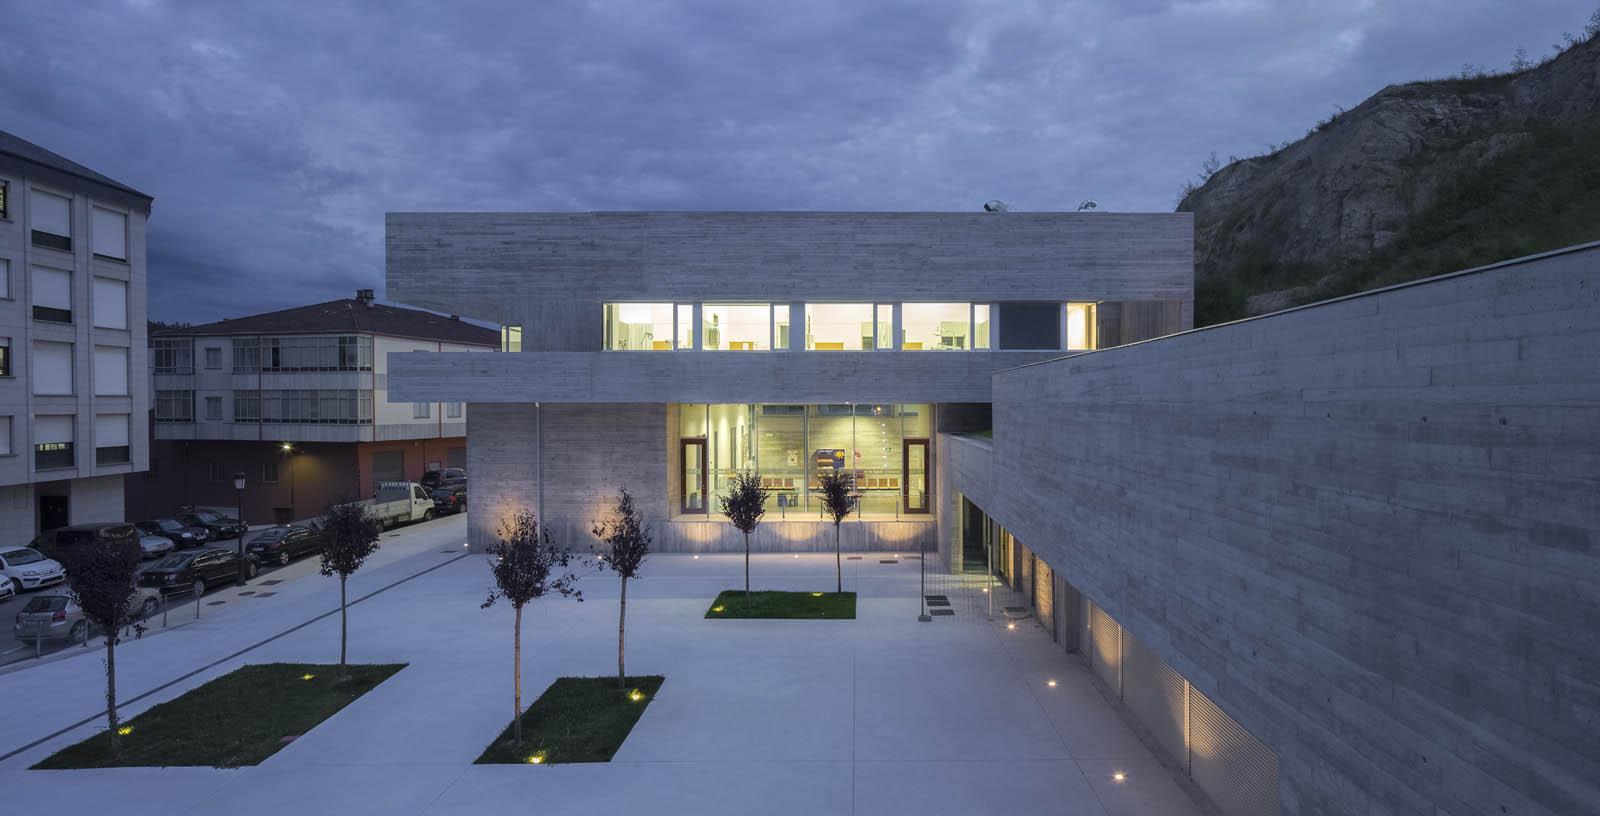 Valenza__Health_Center_008_Architecture_IDOM_Copyright_Aitor_Ortiz